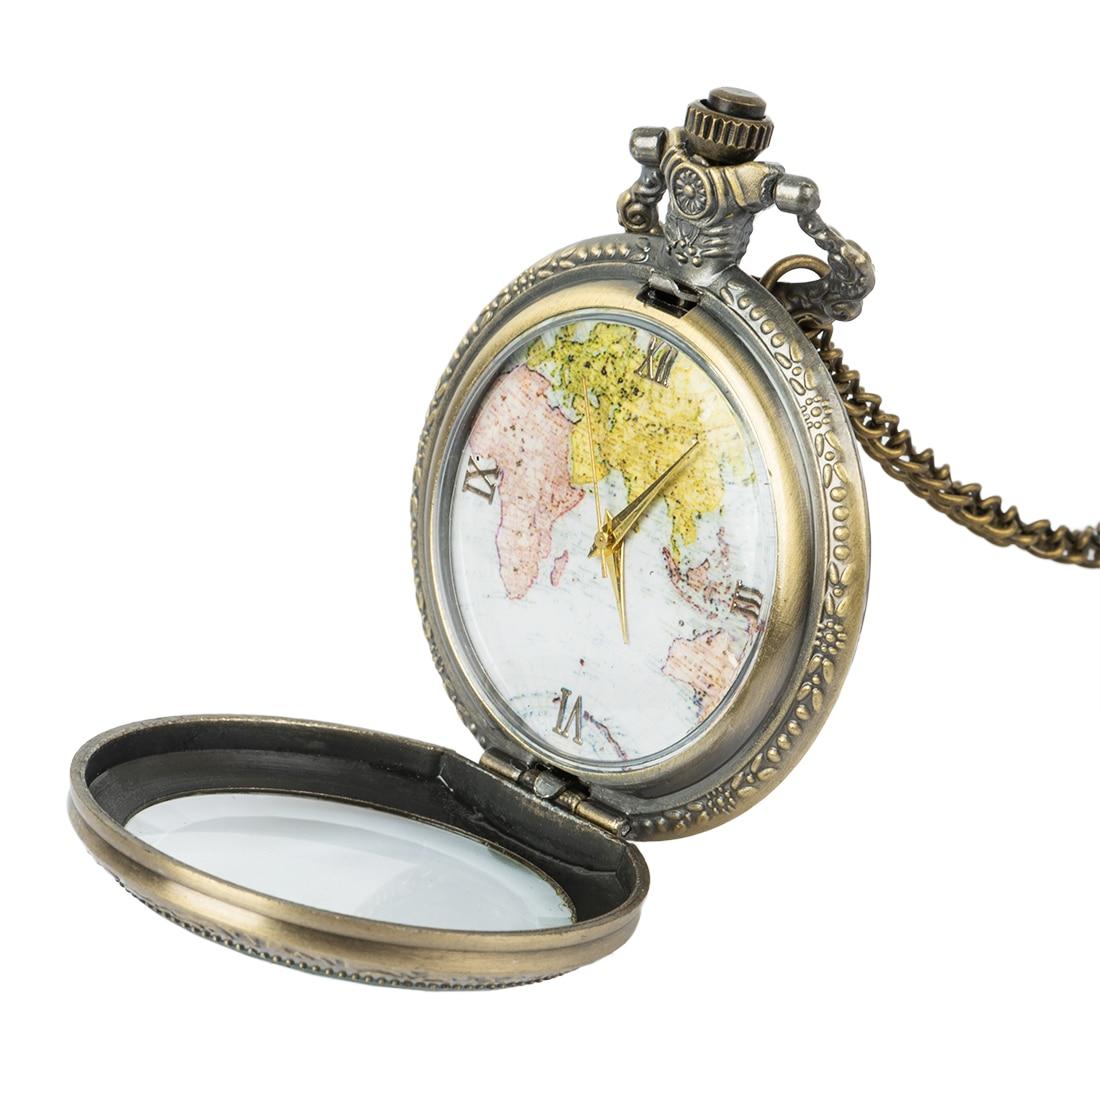 Perfect Gift Christmas Gift Retro Antique Chain Map Necklace Pendant Pocket Watch Hogwarts Pocket Watch Fullmetal Alchemist